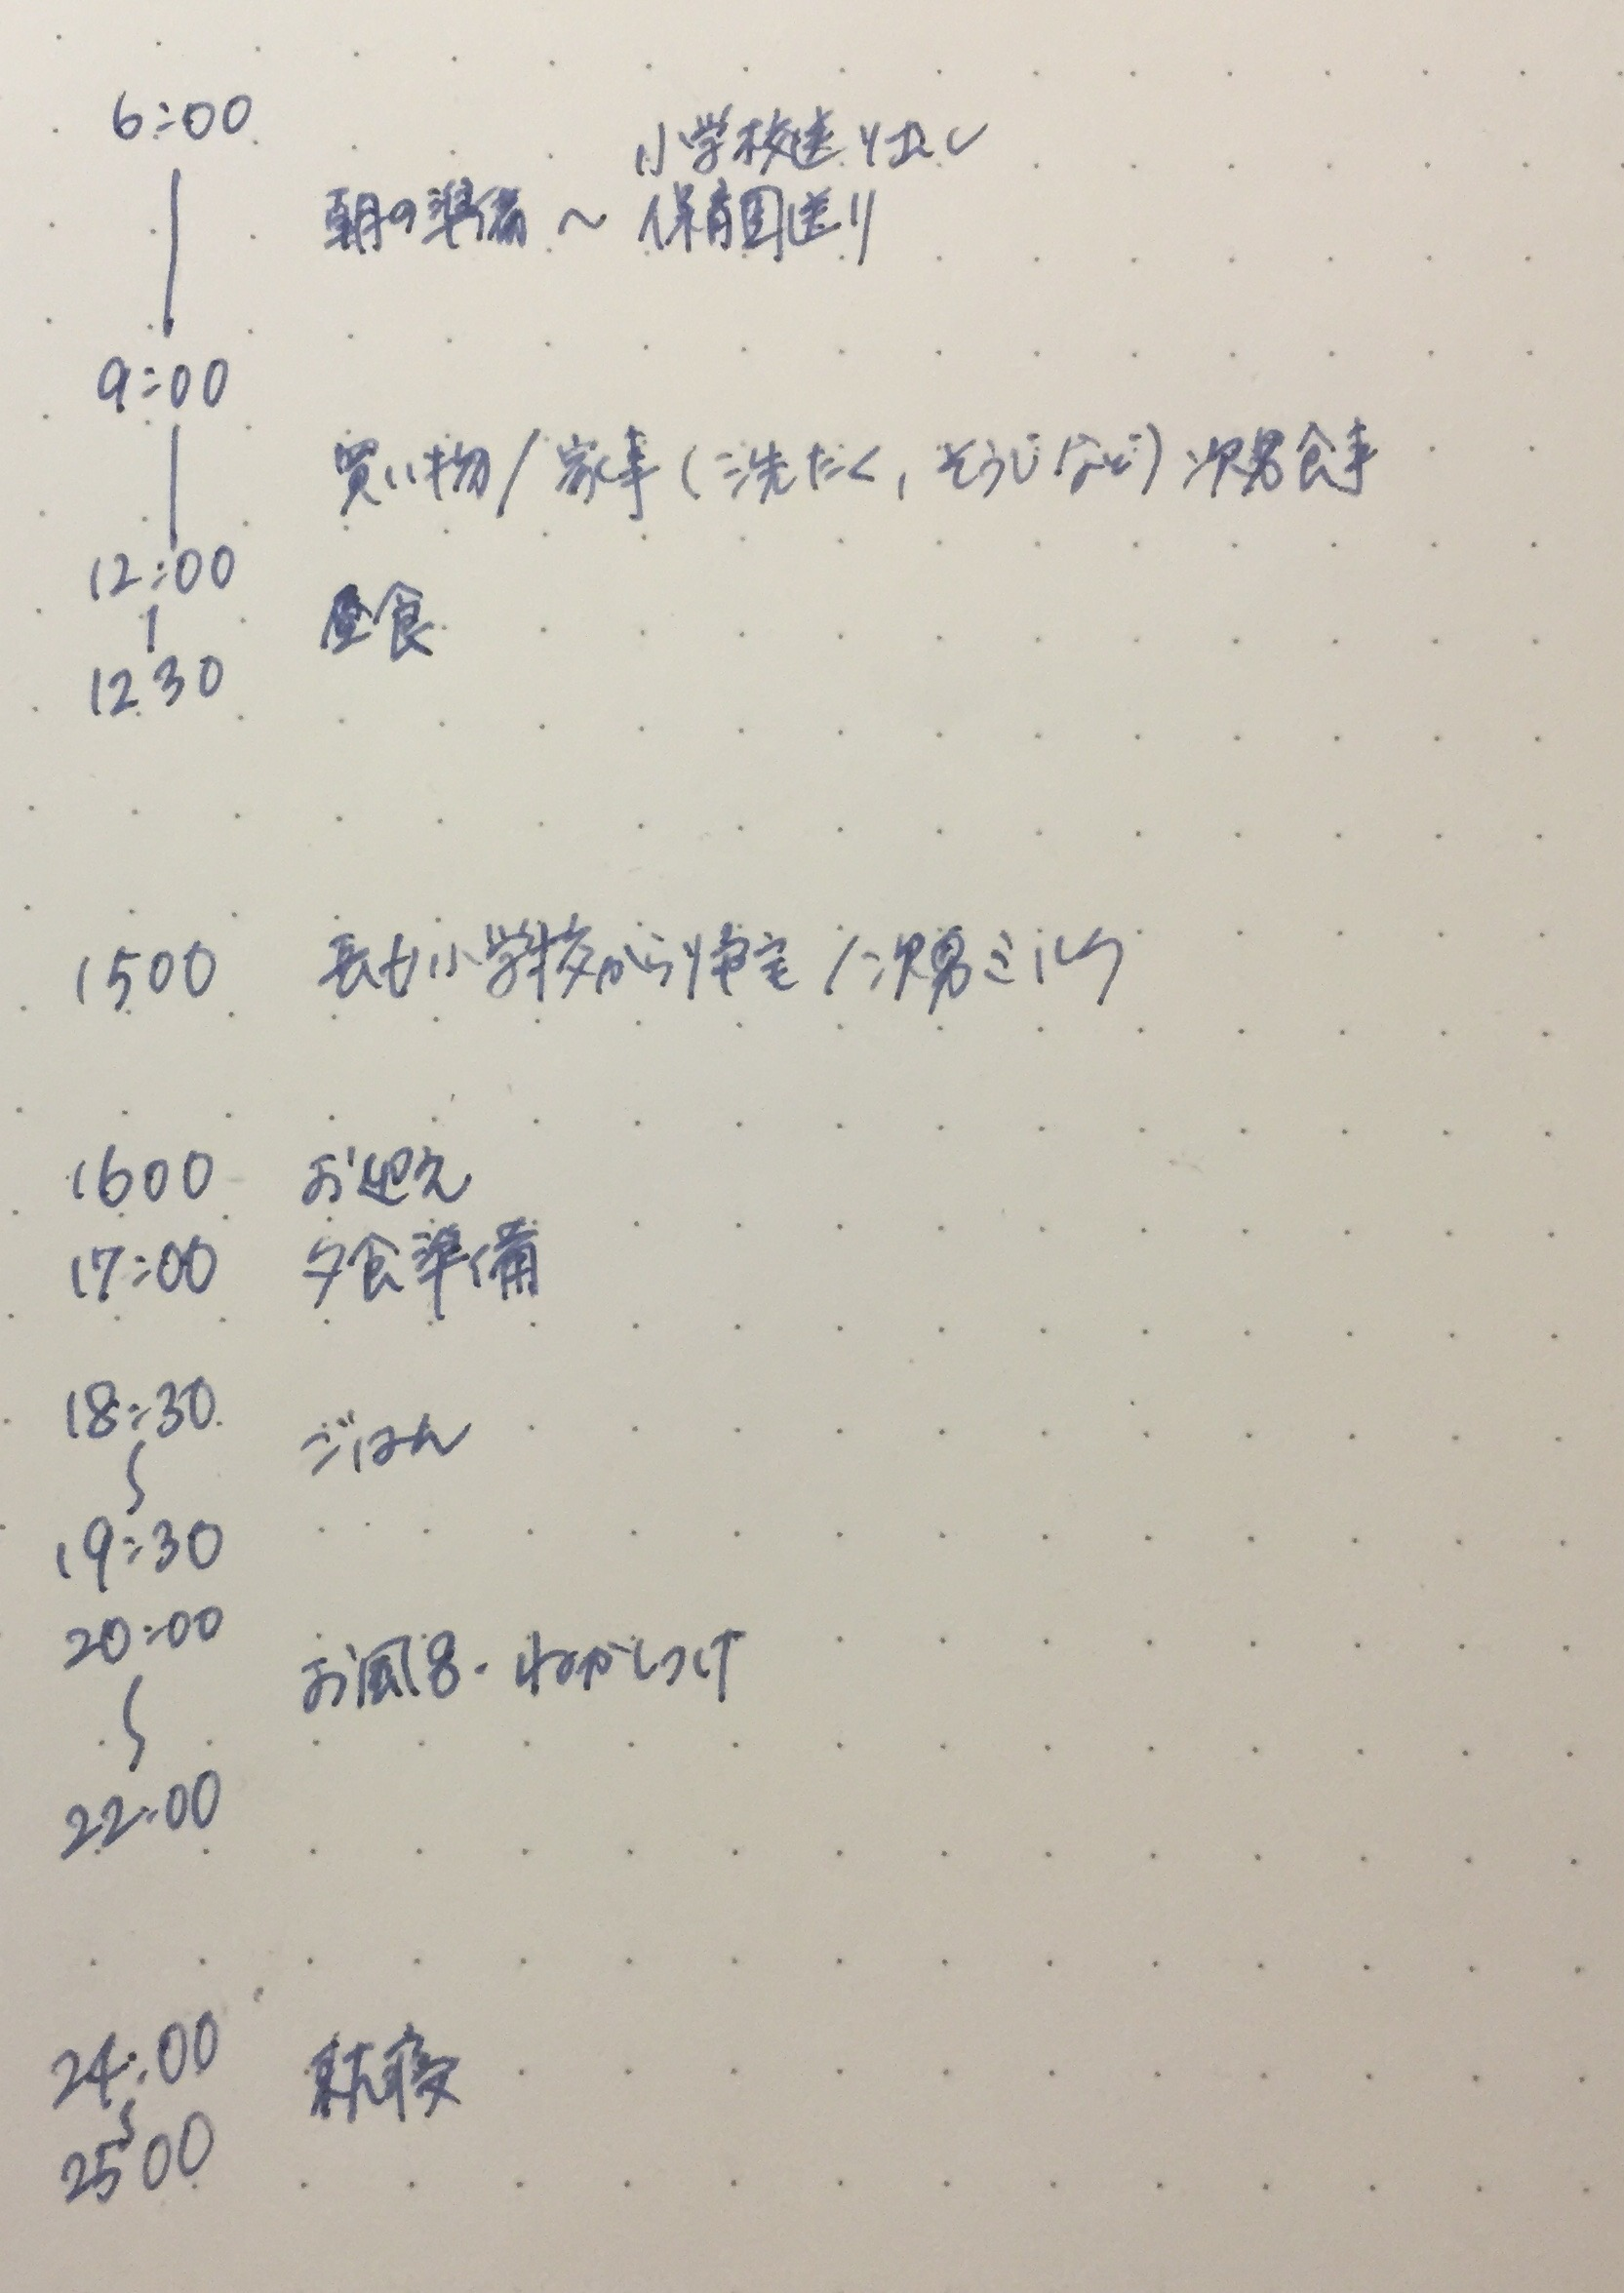 IMG_1650-0.jpg